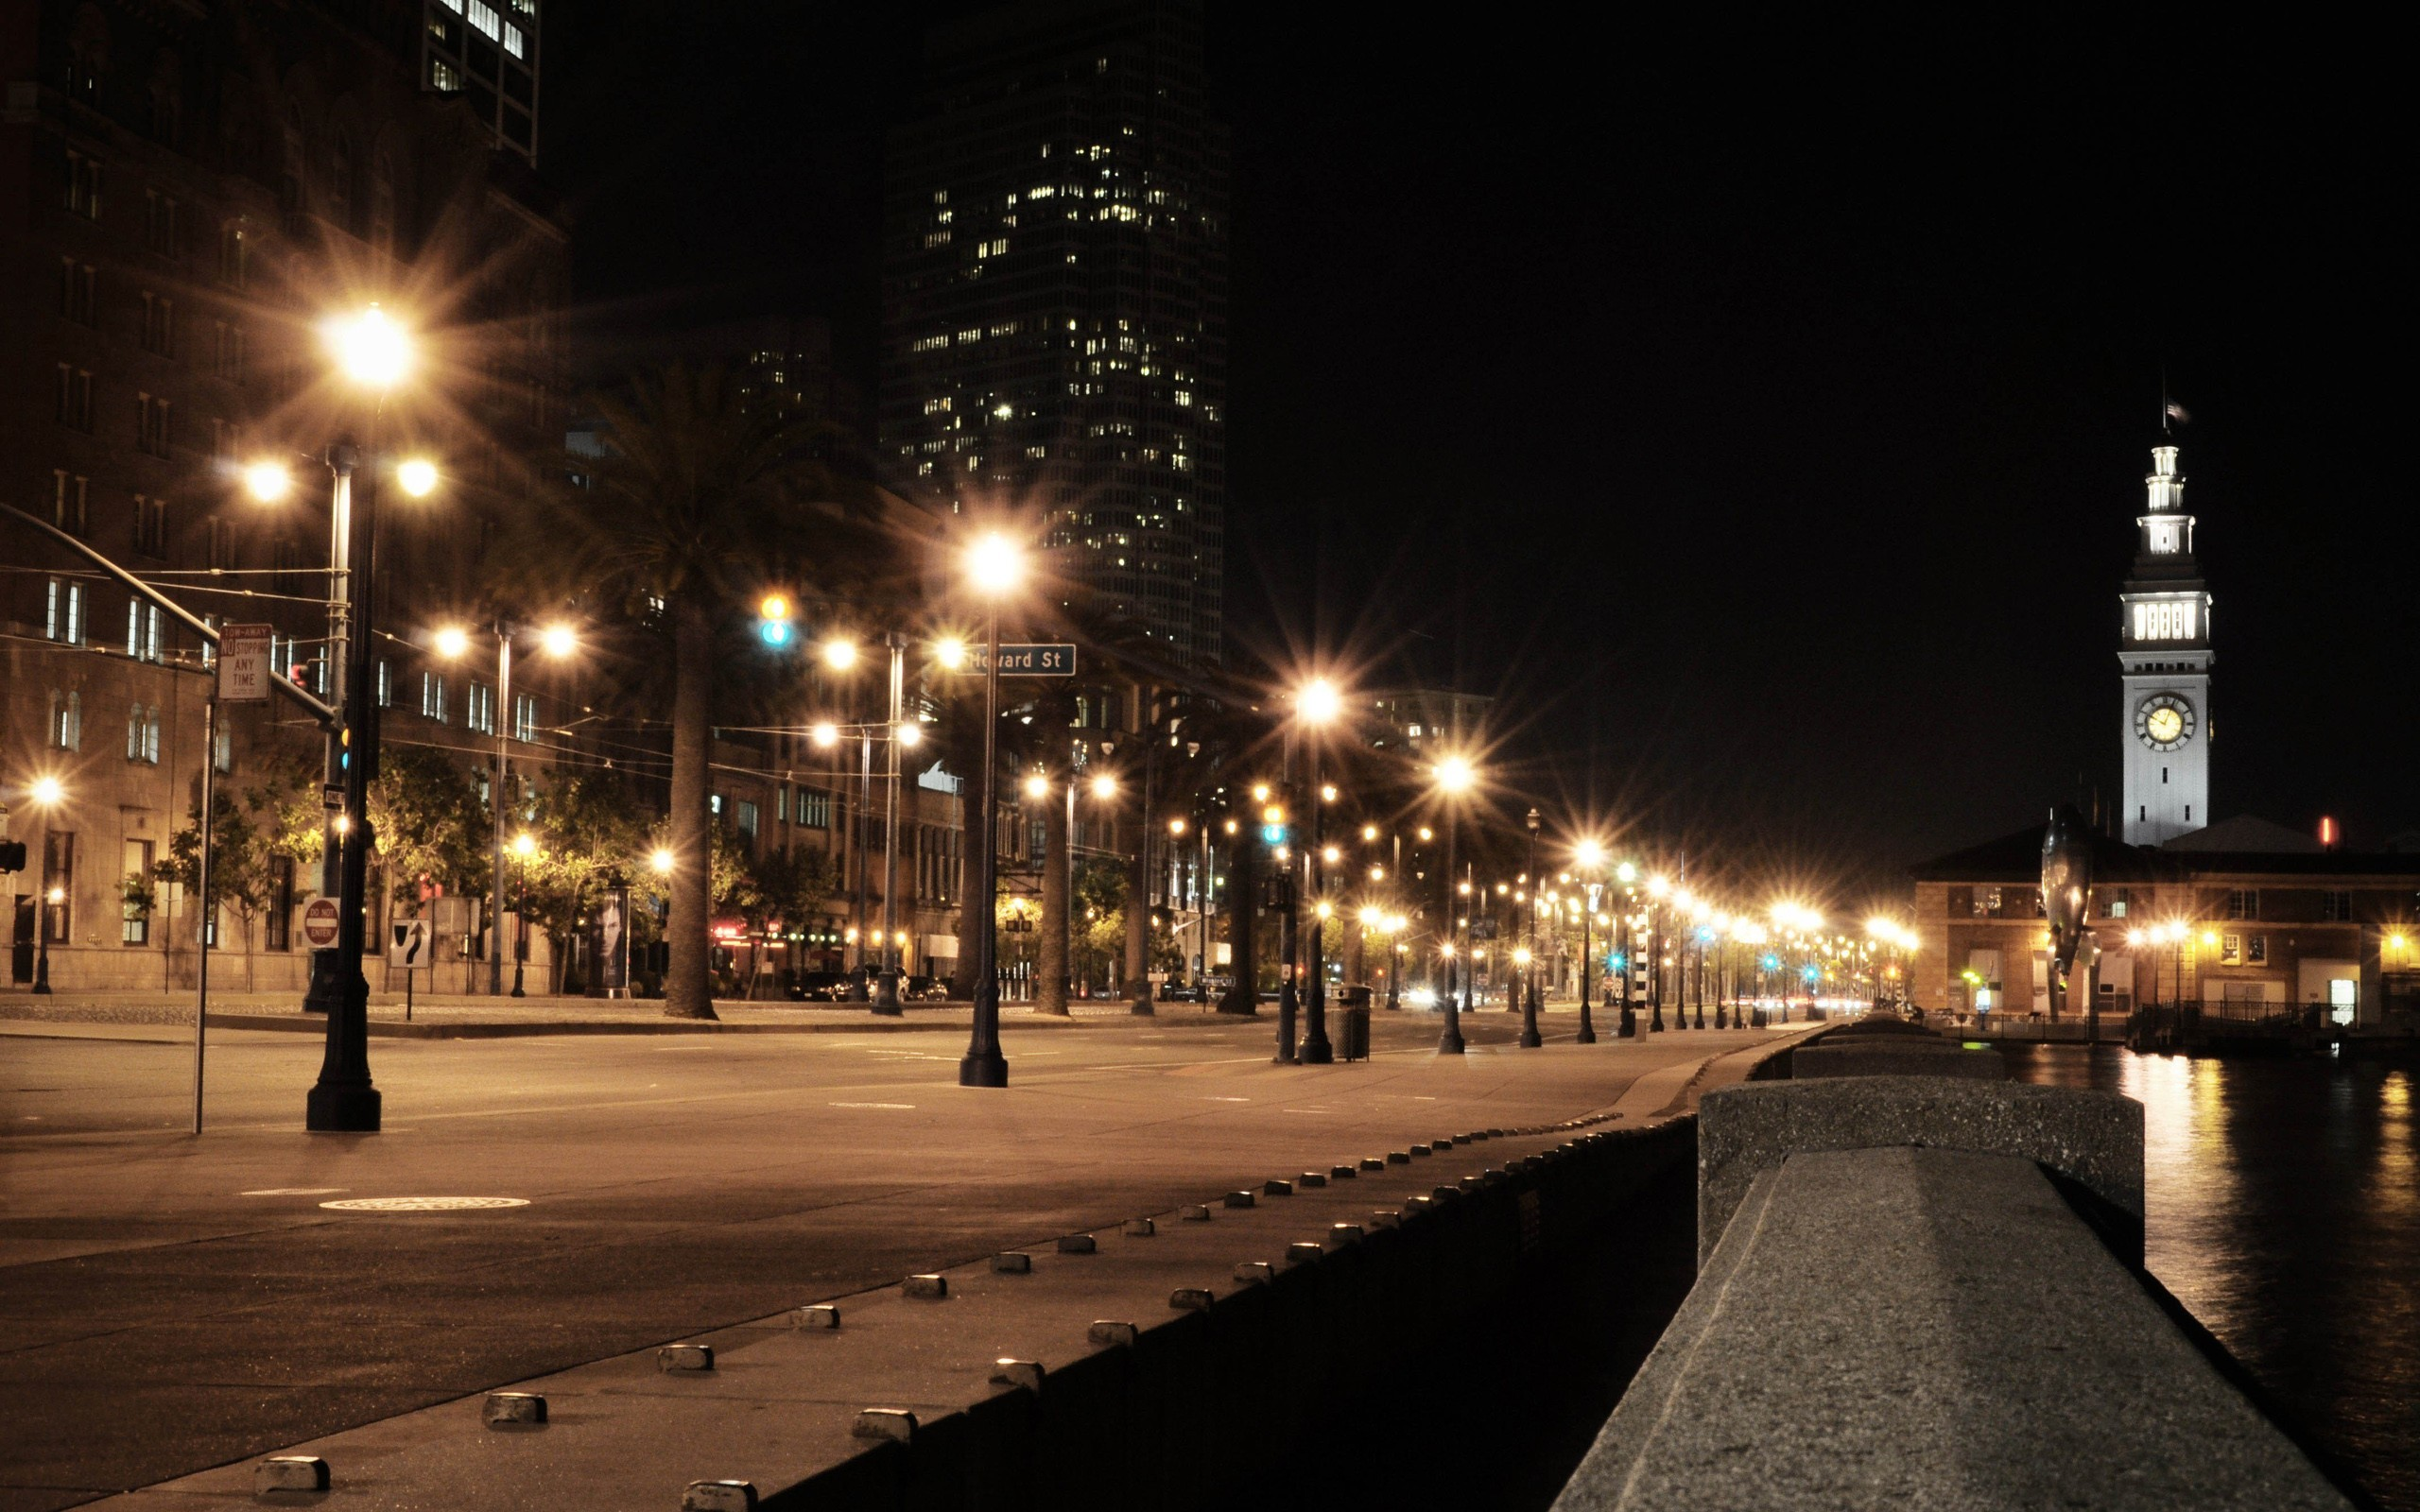 1280x1920 Tower City Night Road Street